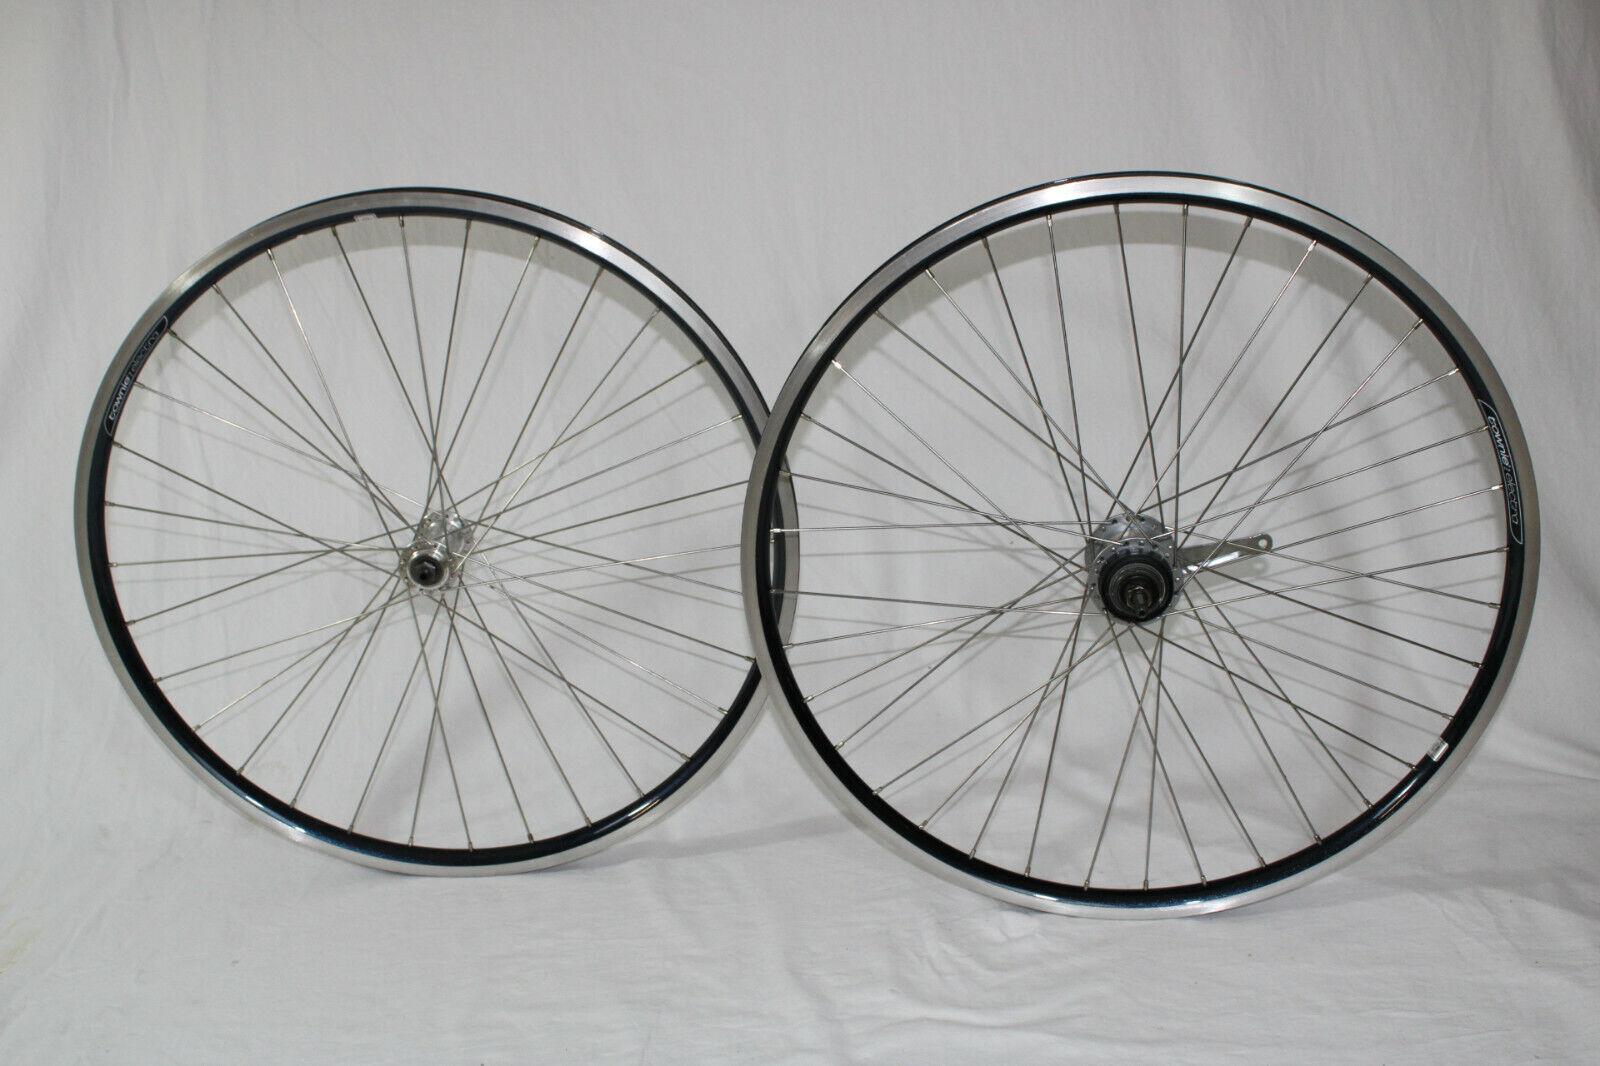 Electra townie Dark azul metallic ruedas 26  Shimano 3 marchas Cruiser citybike